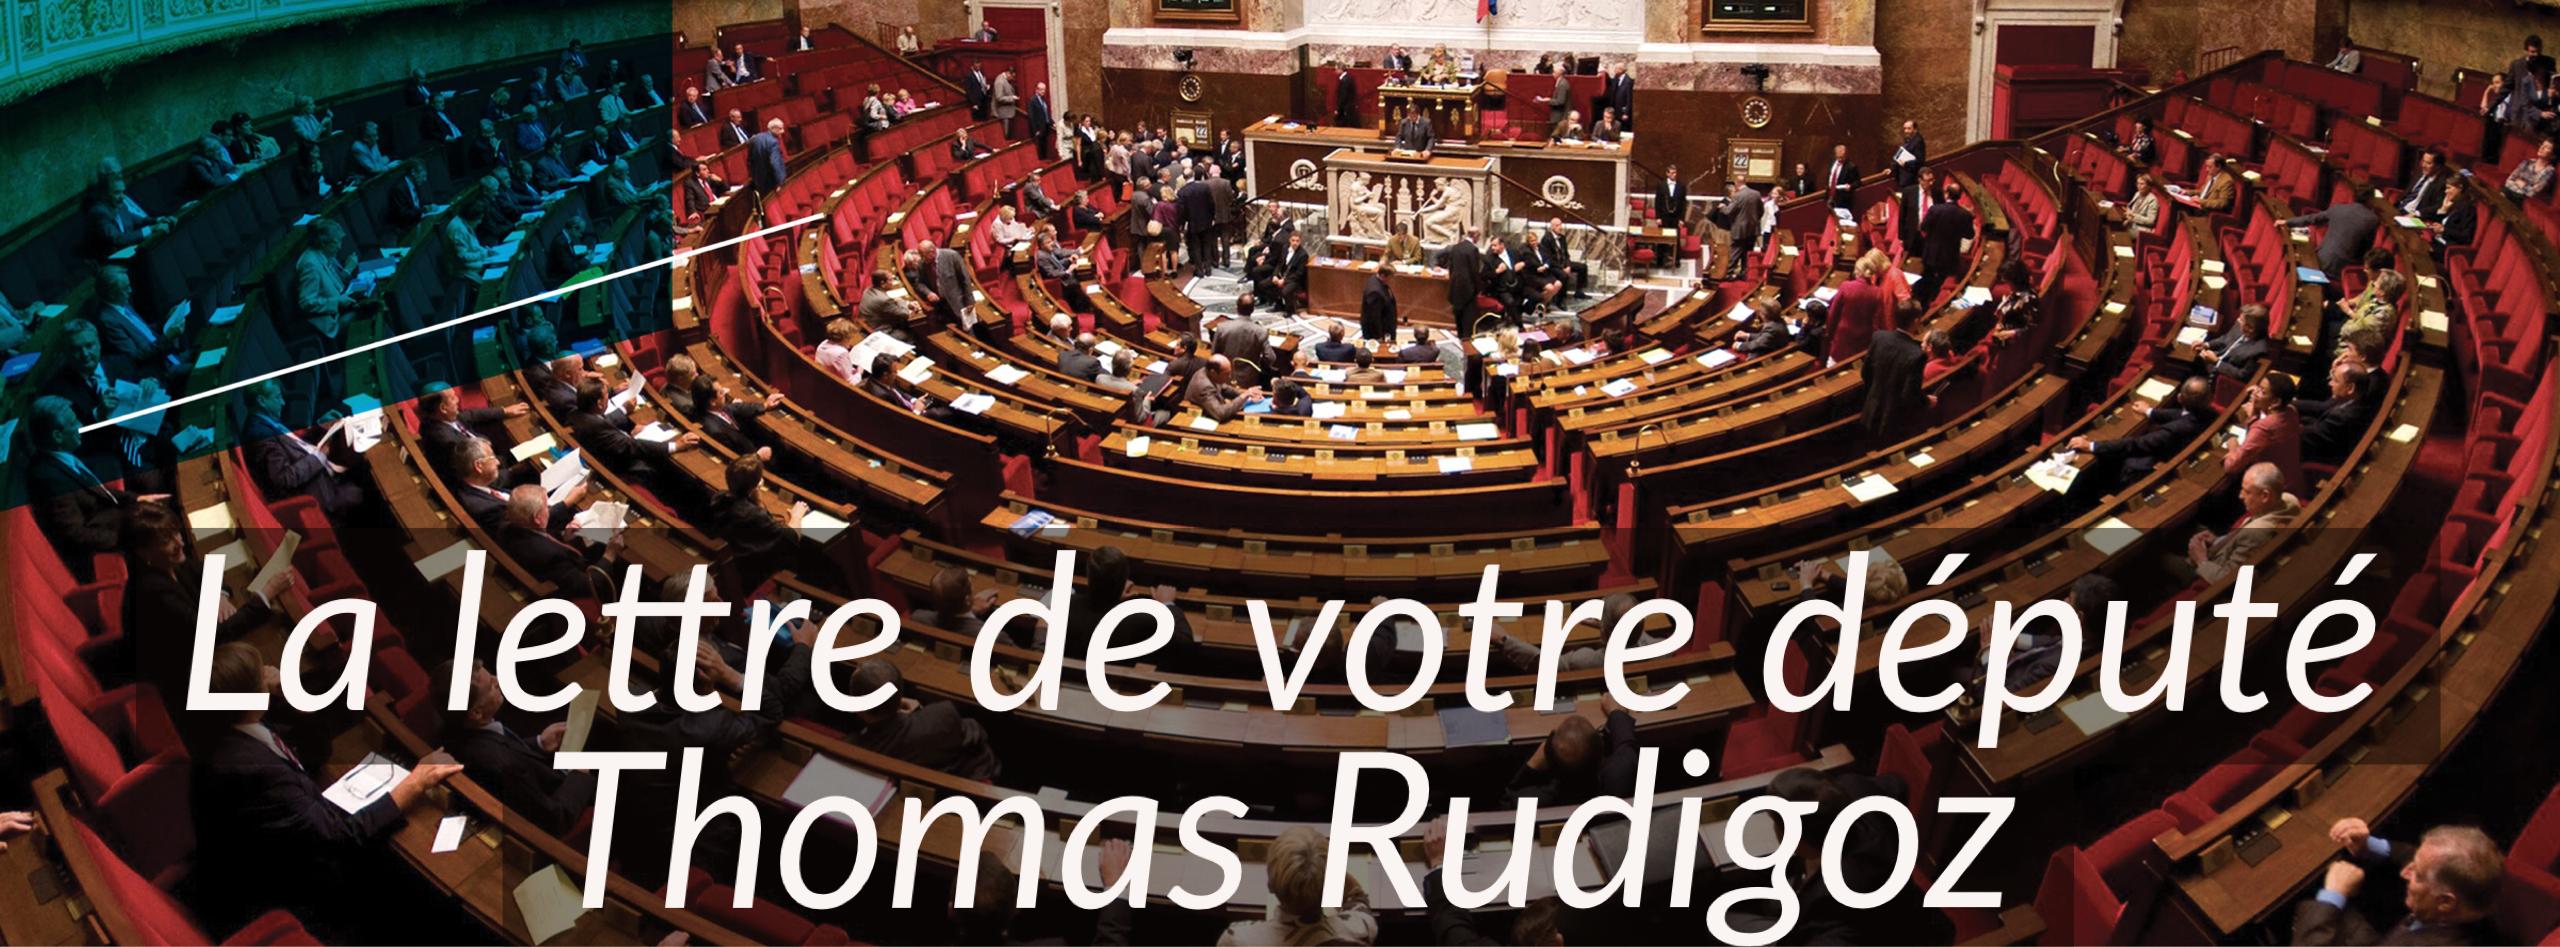 Thomas Rudigoz, député du Rhône